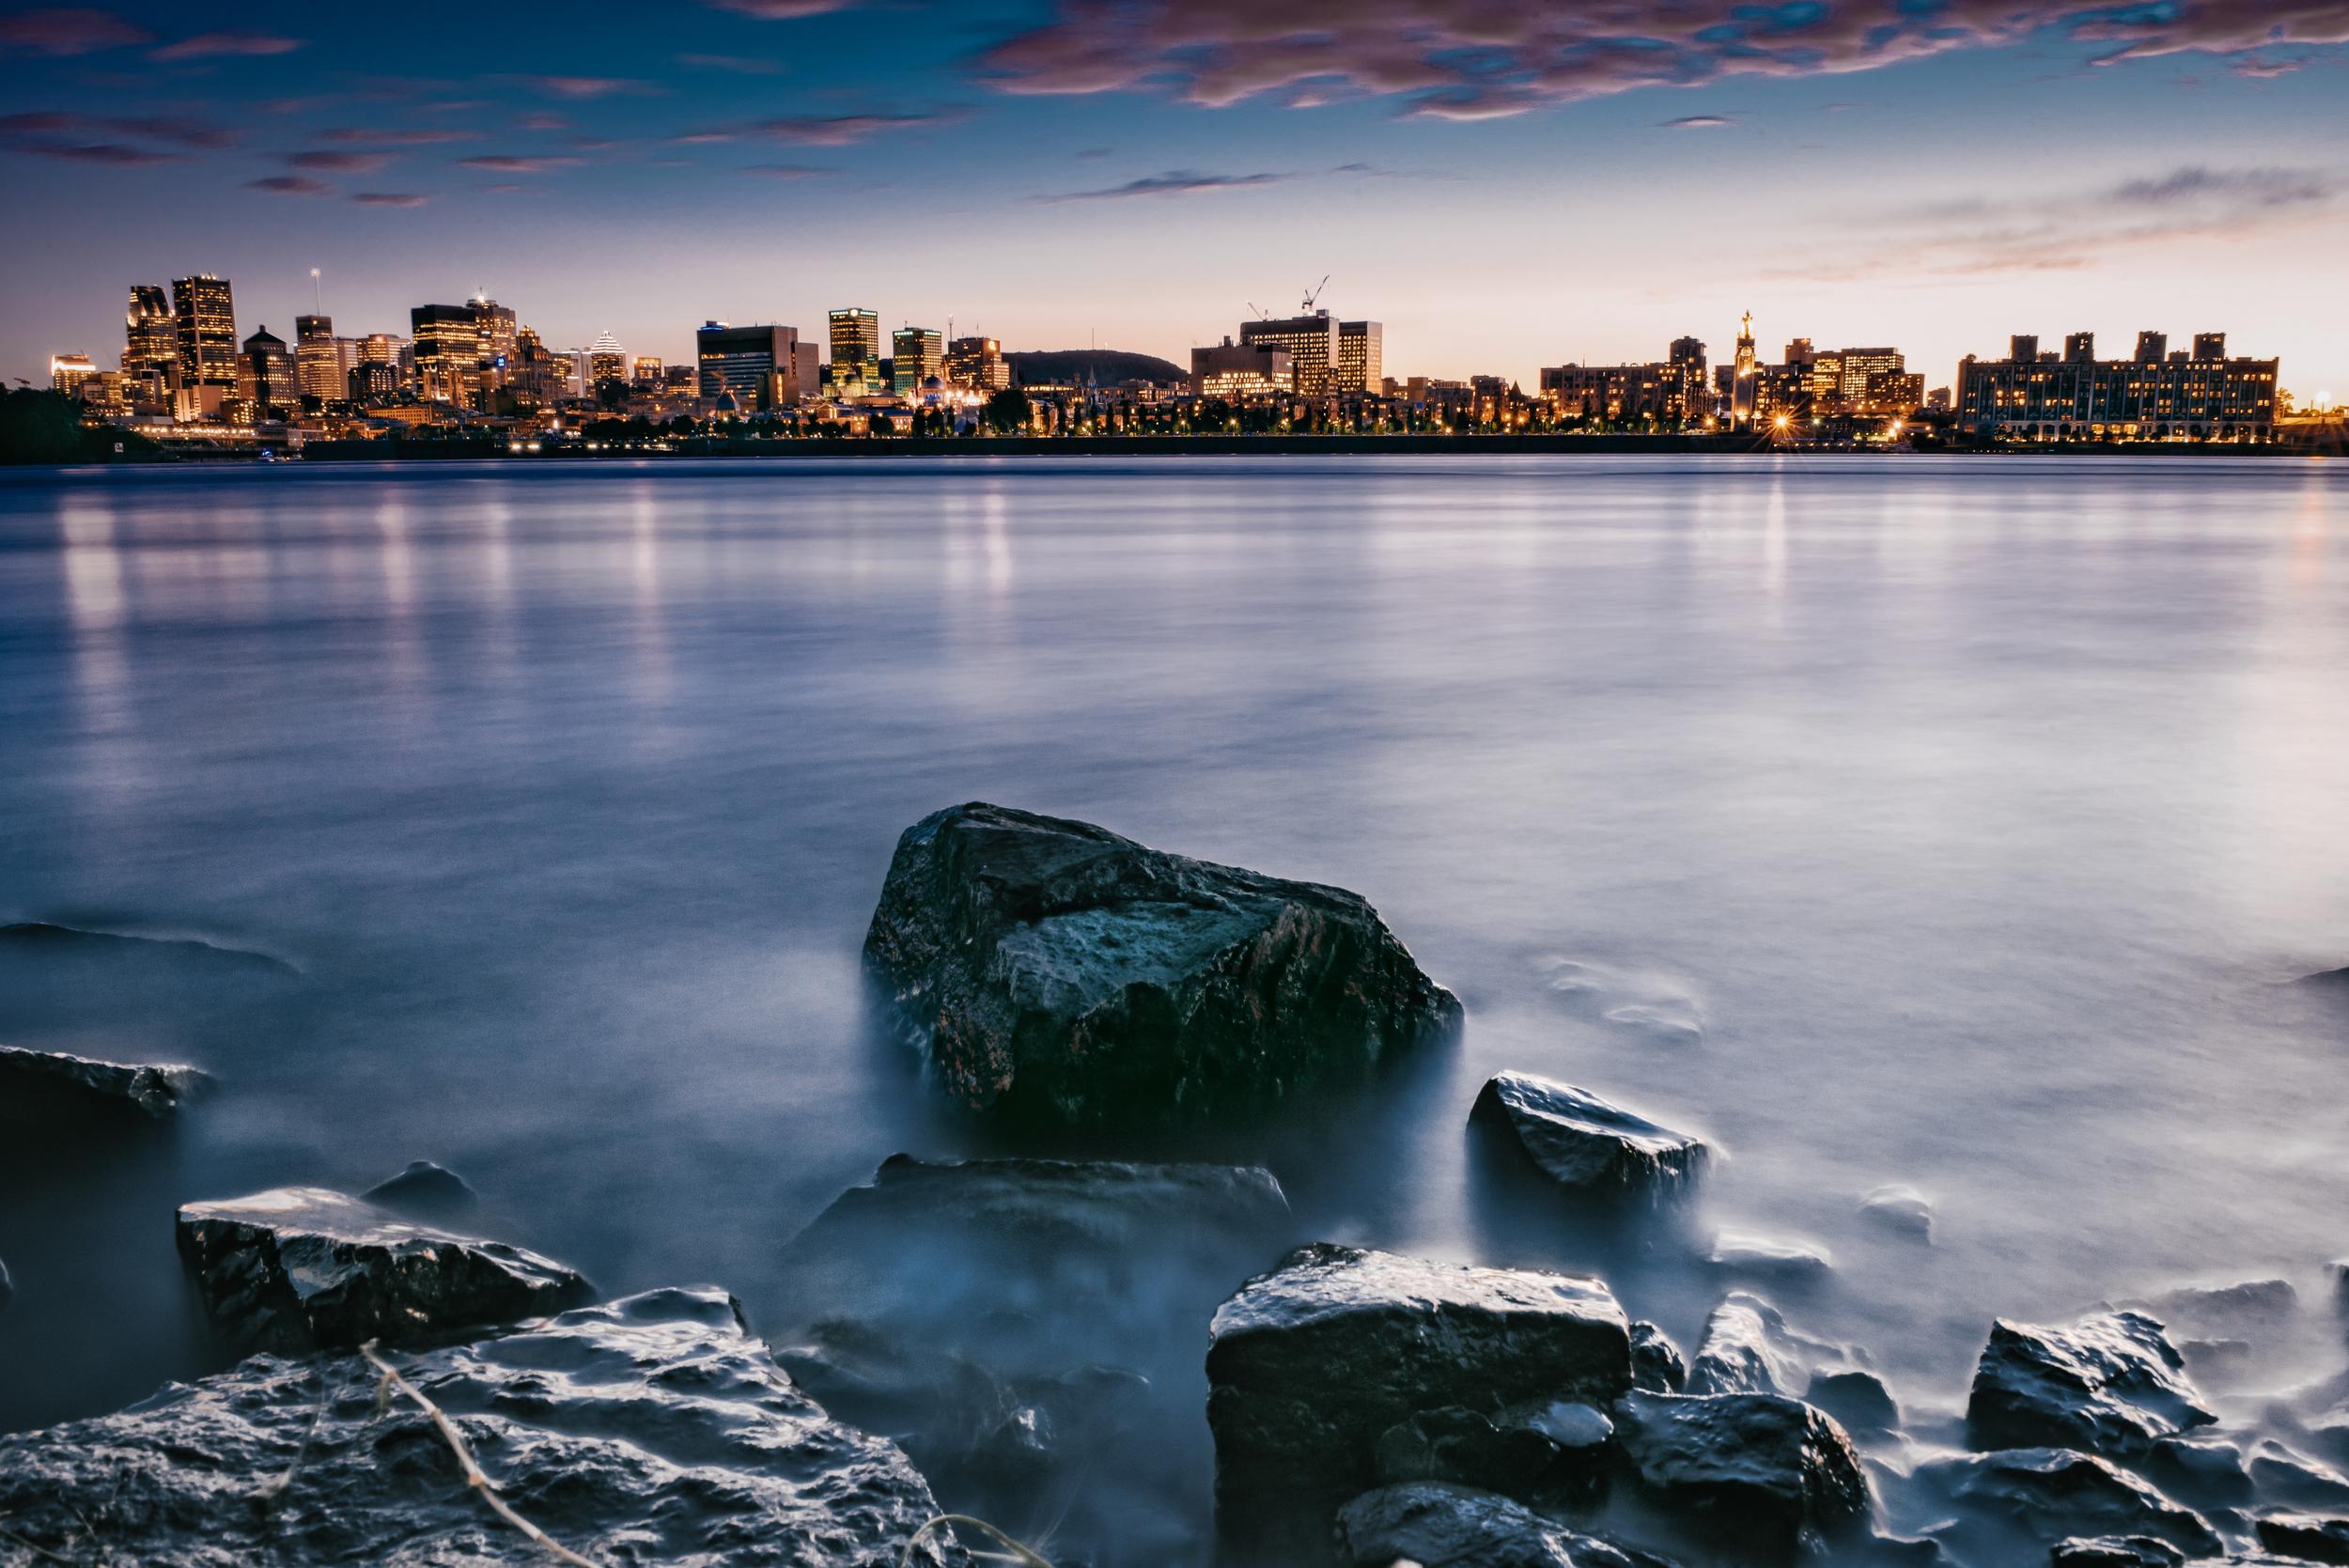 Cityscape_Rocks_2.jpg